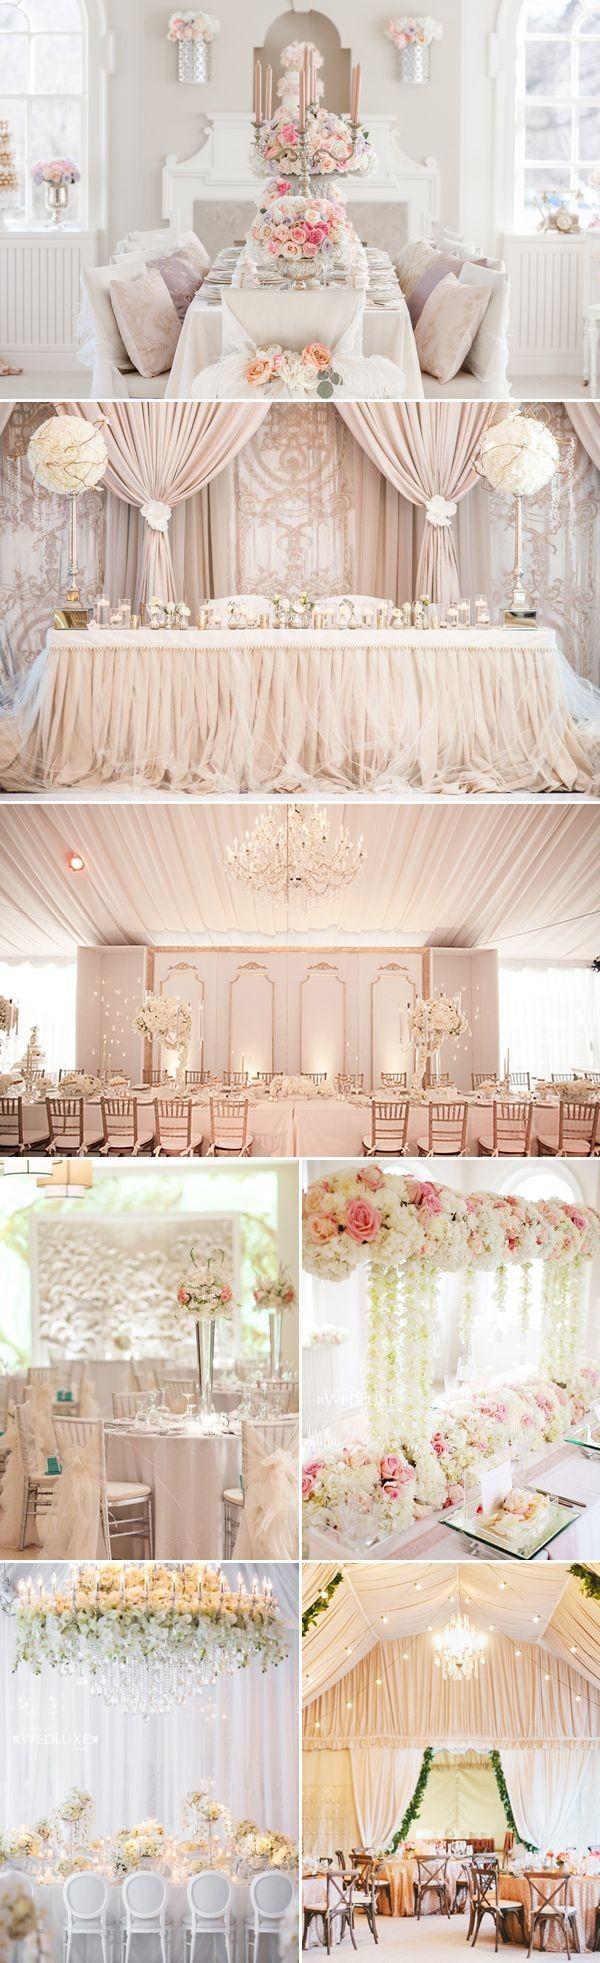 stunning luxury indoor reception decoration ideas you donut want